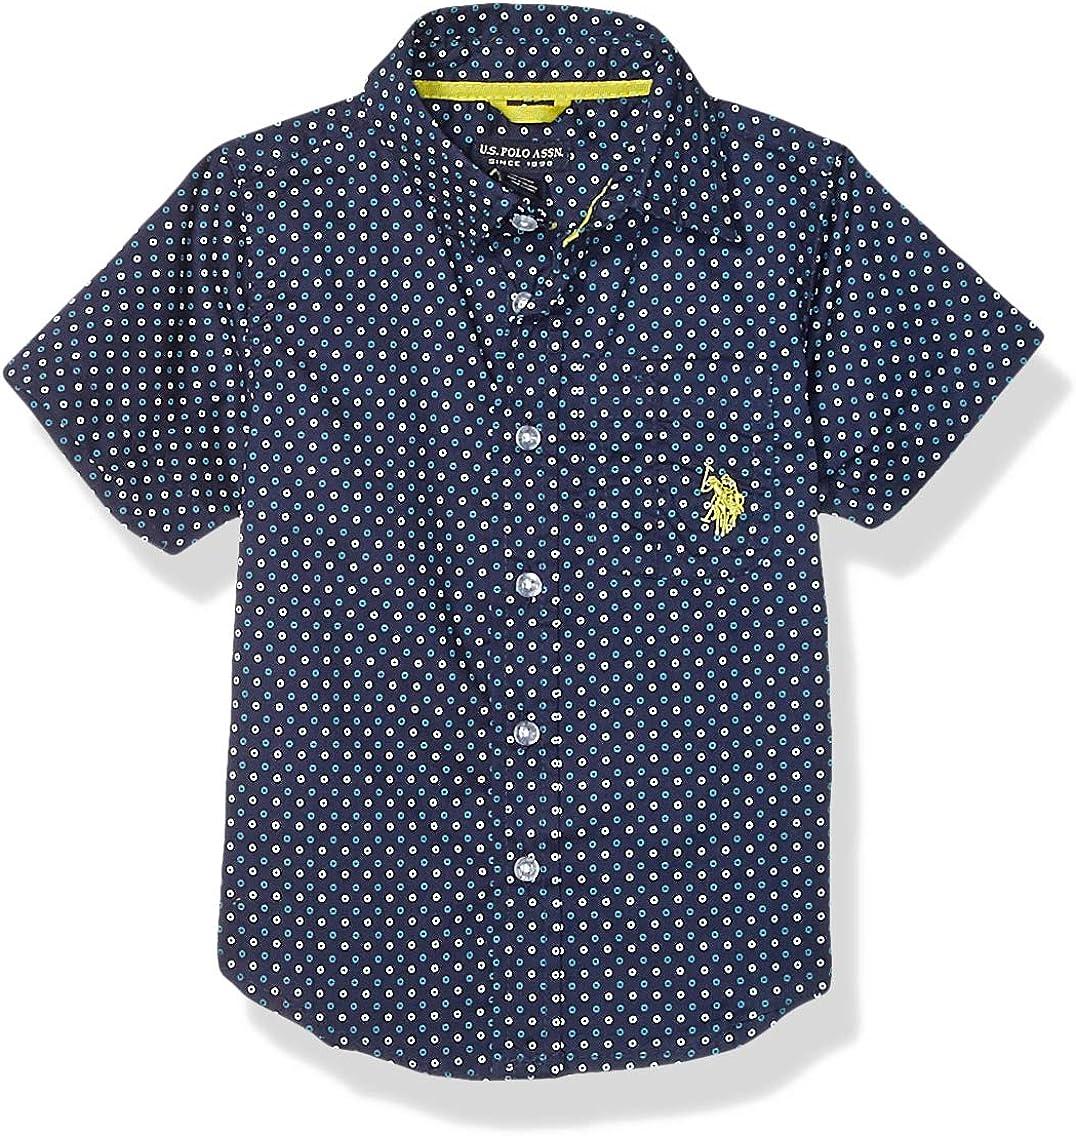 U.S. Polo Assn. Boys' Short Sleeve Printed Woven Shirt